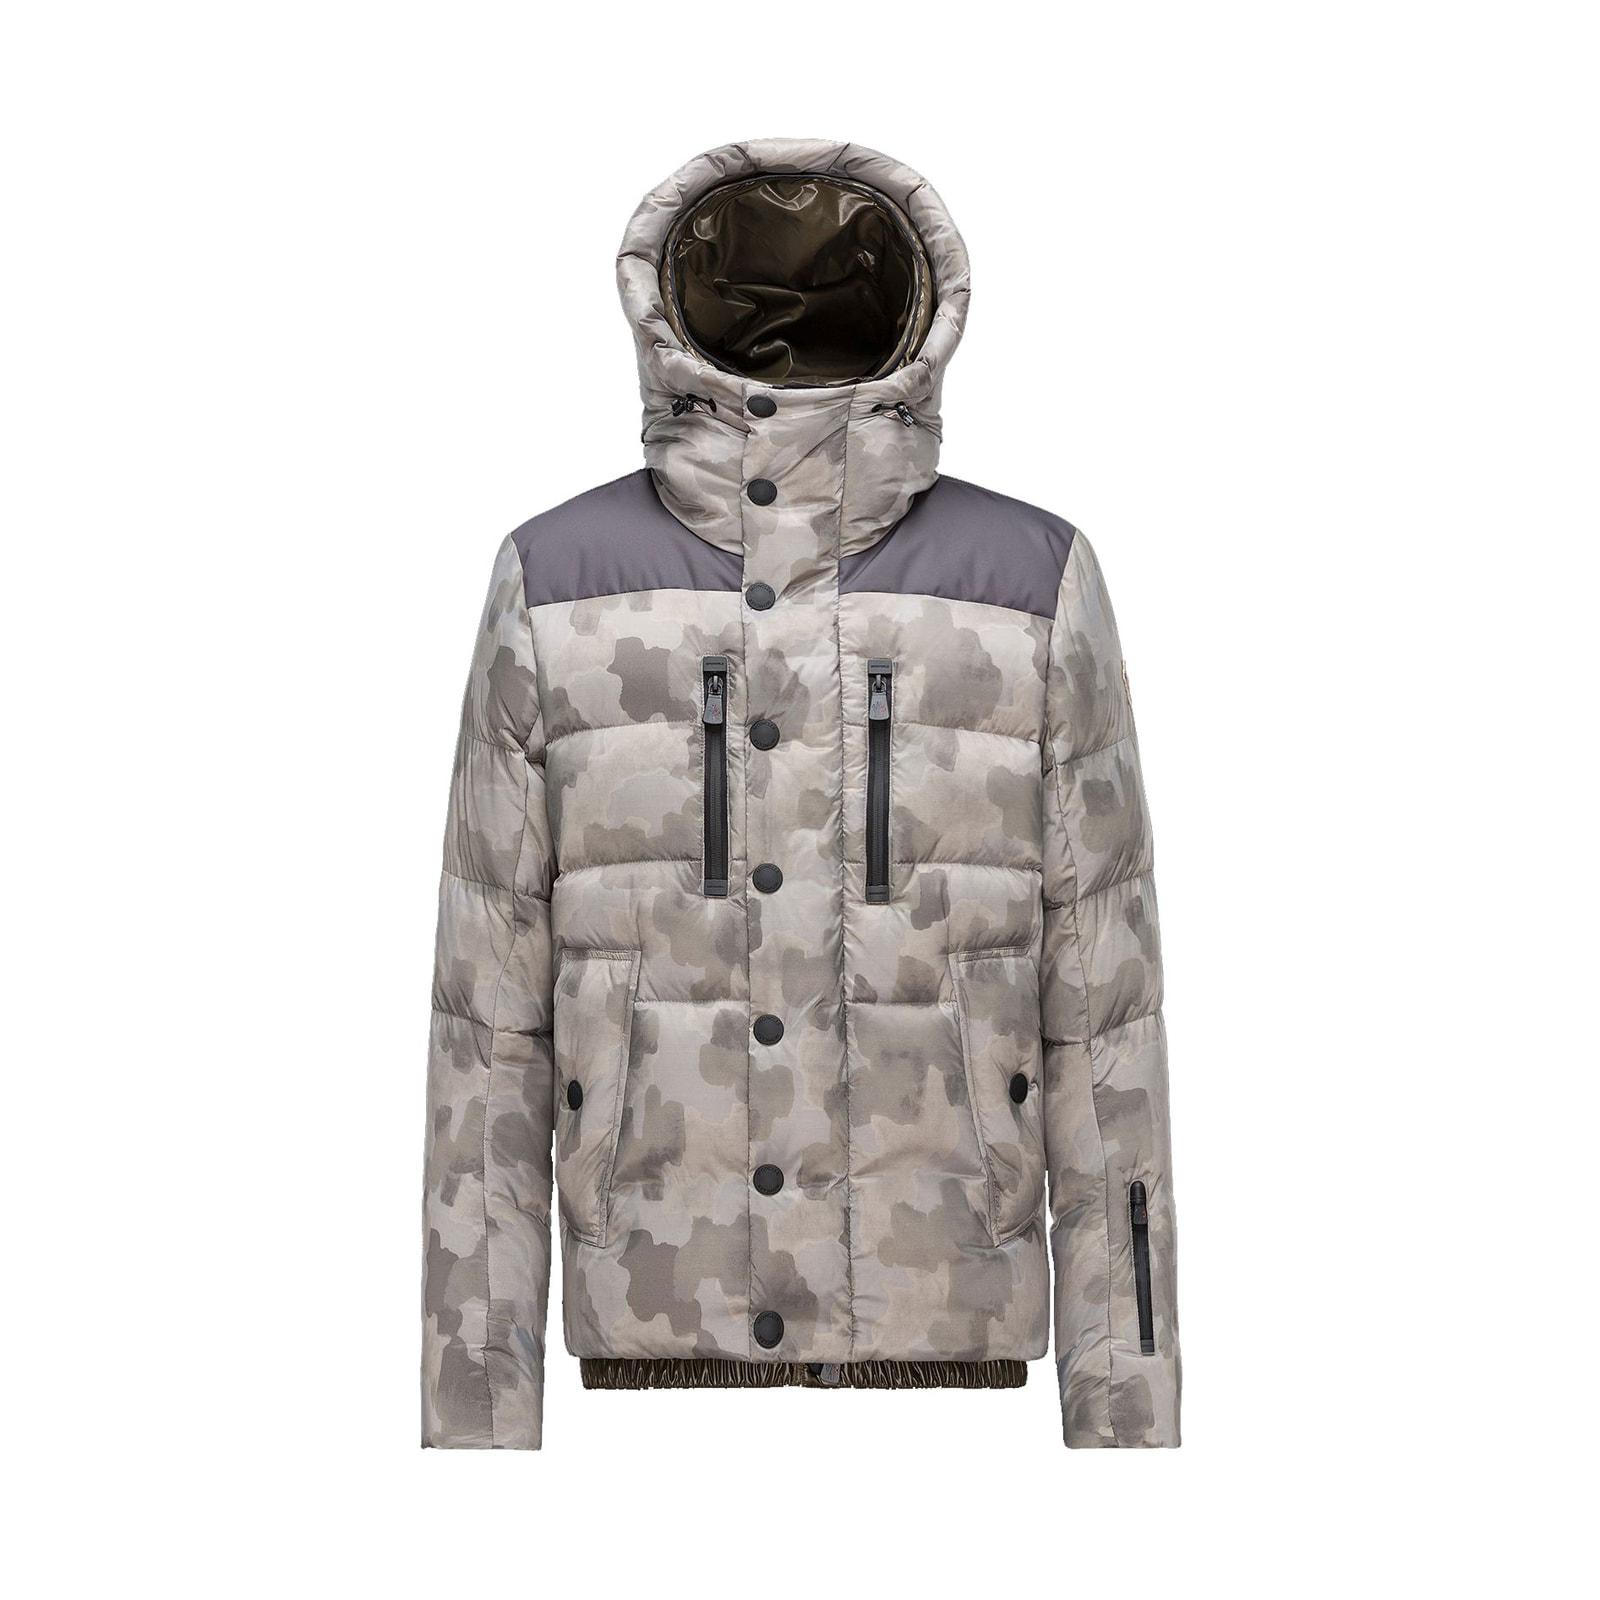 Moncler Grenoble Rodenberg Camouflage Coat